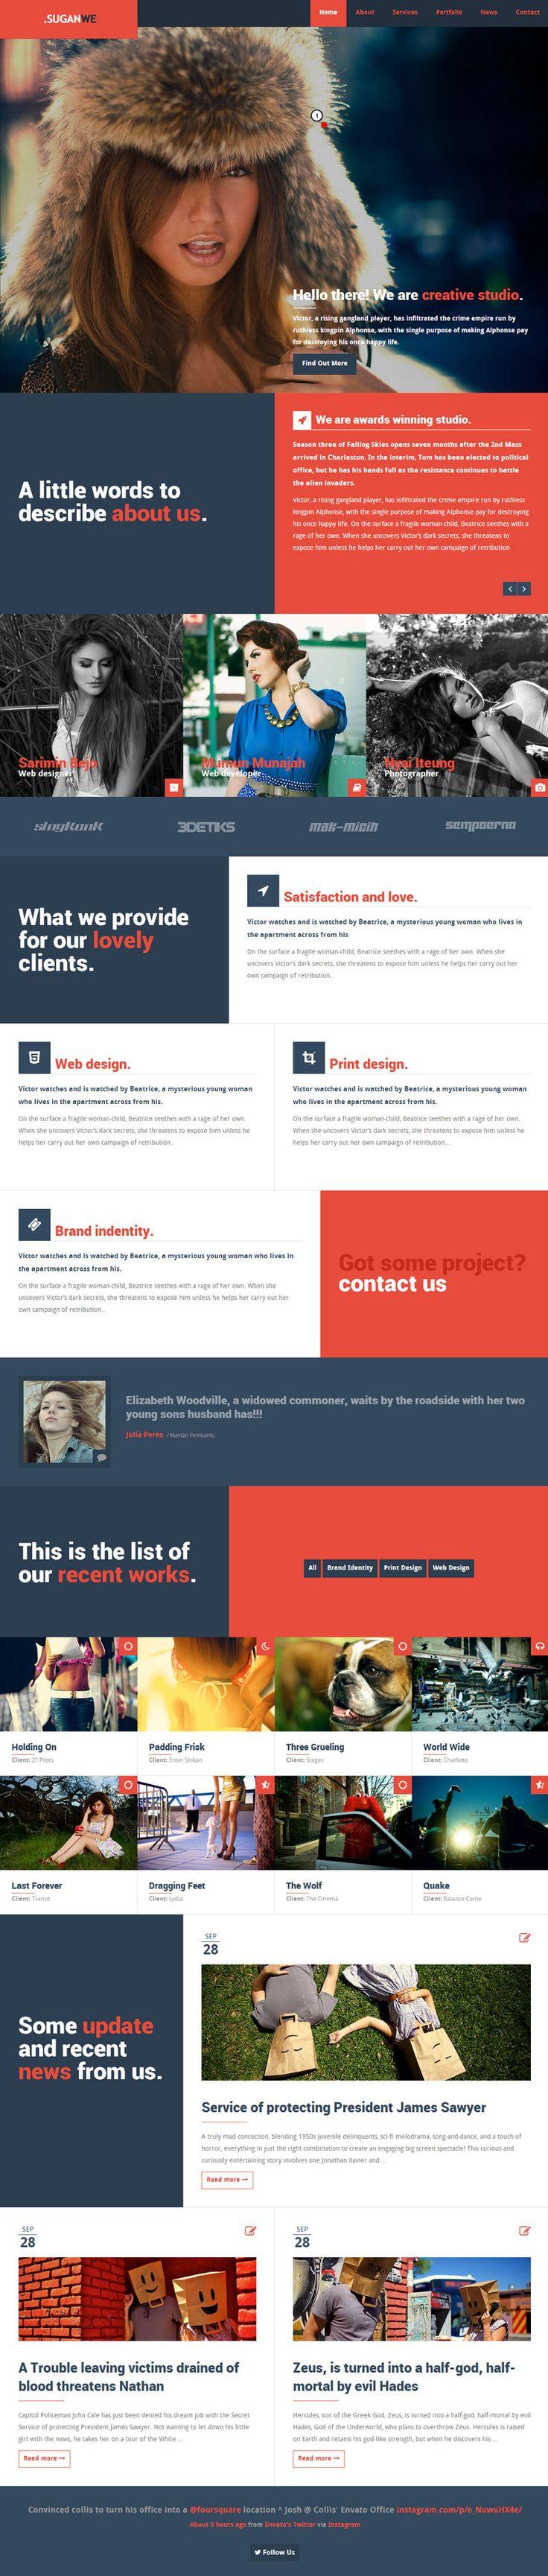 block, space, clean, #concept